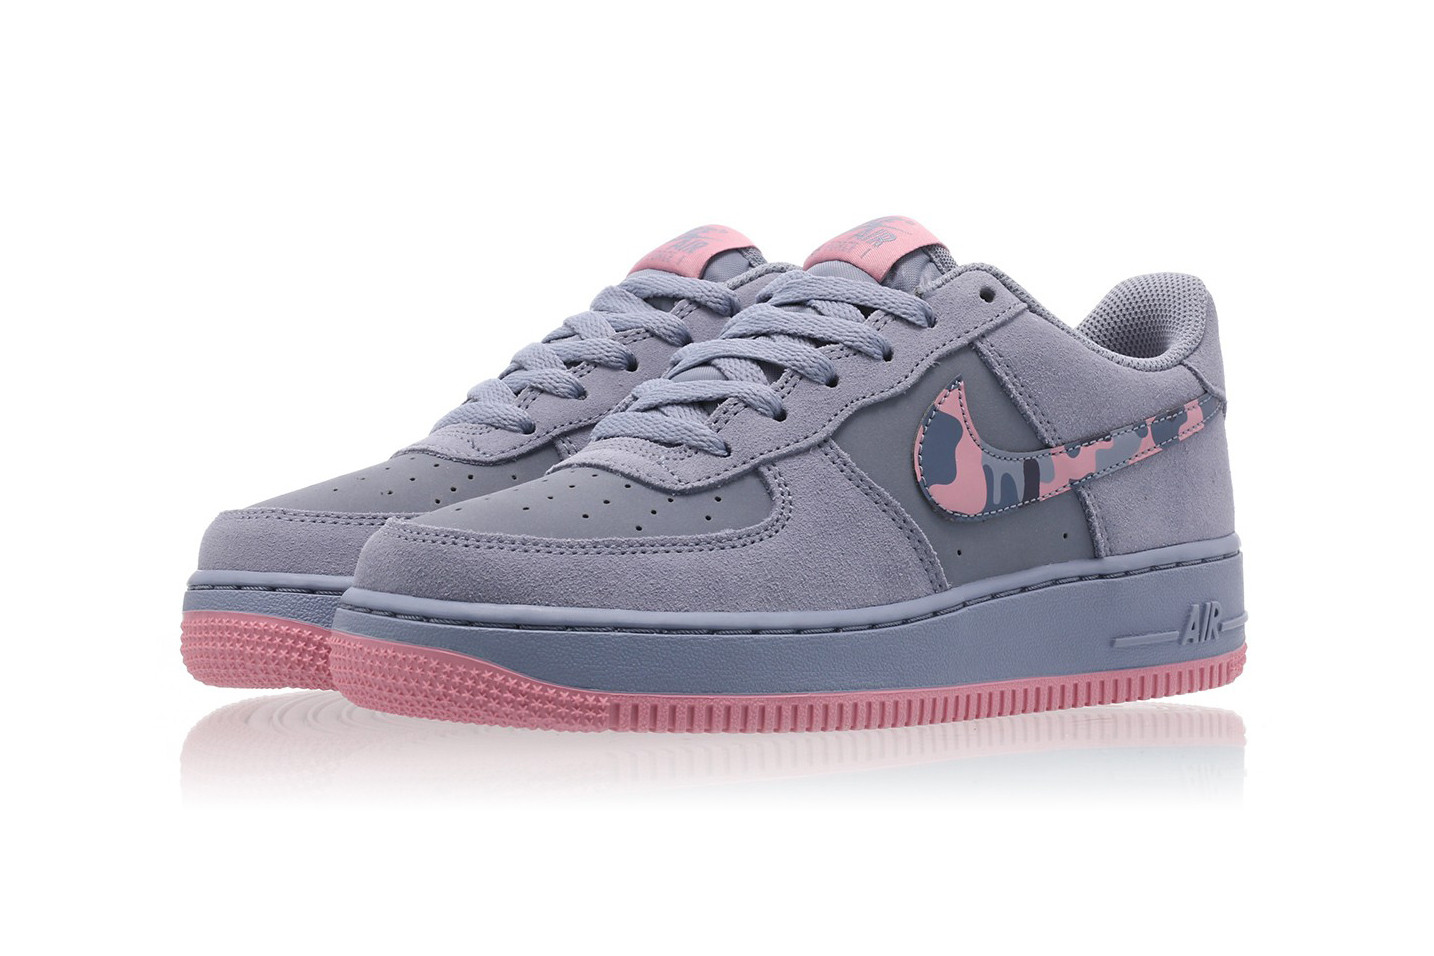 Nike Air Force 1 With Pink \u0026 Purple